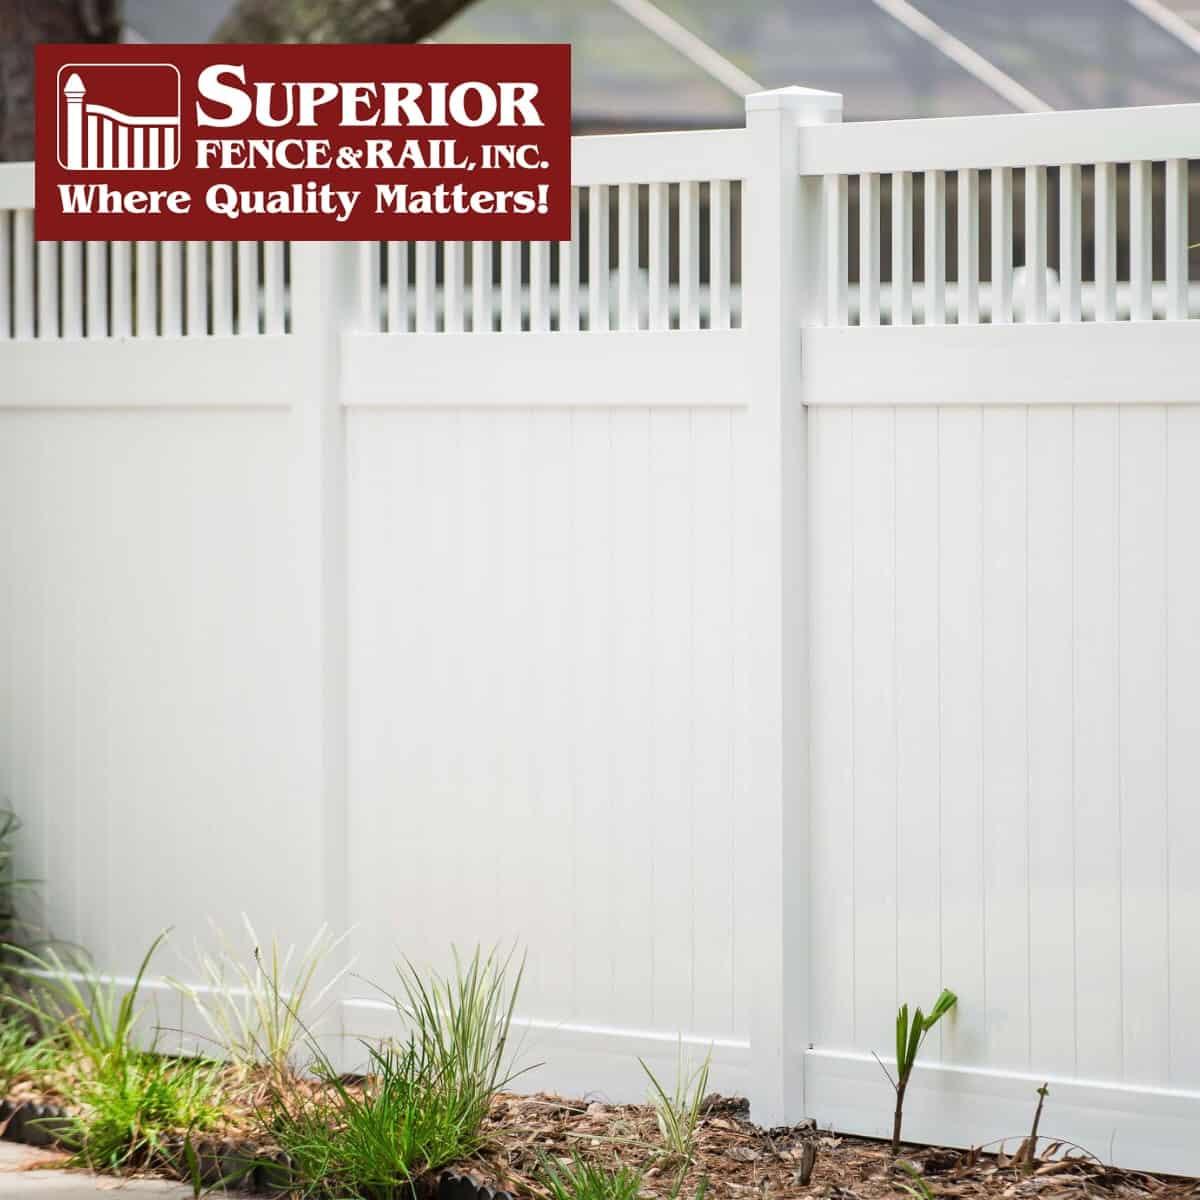 Sarasota fence company contractor